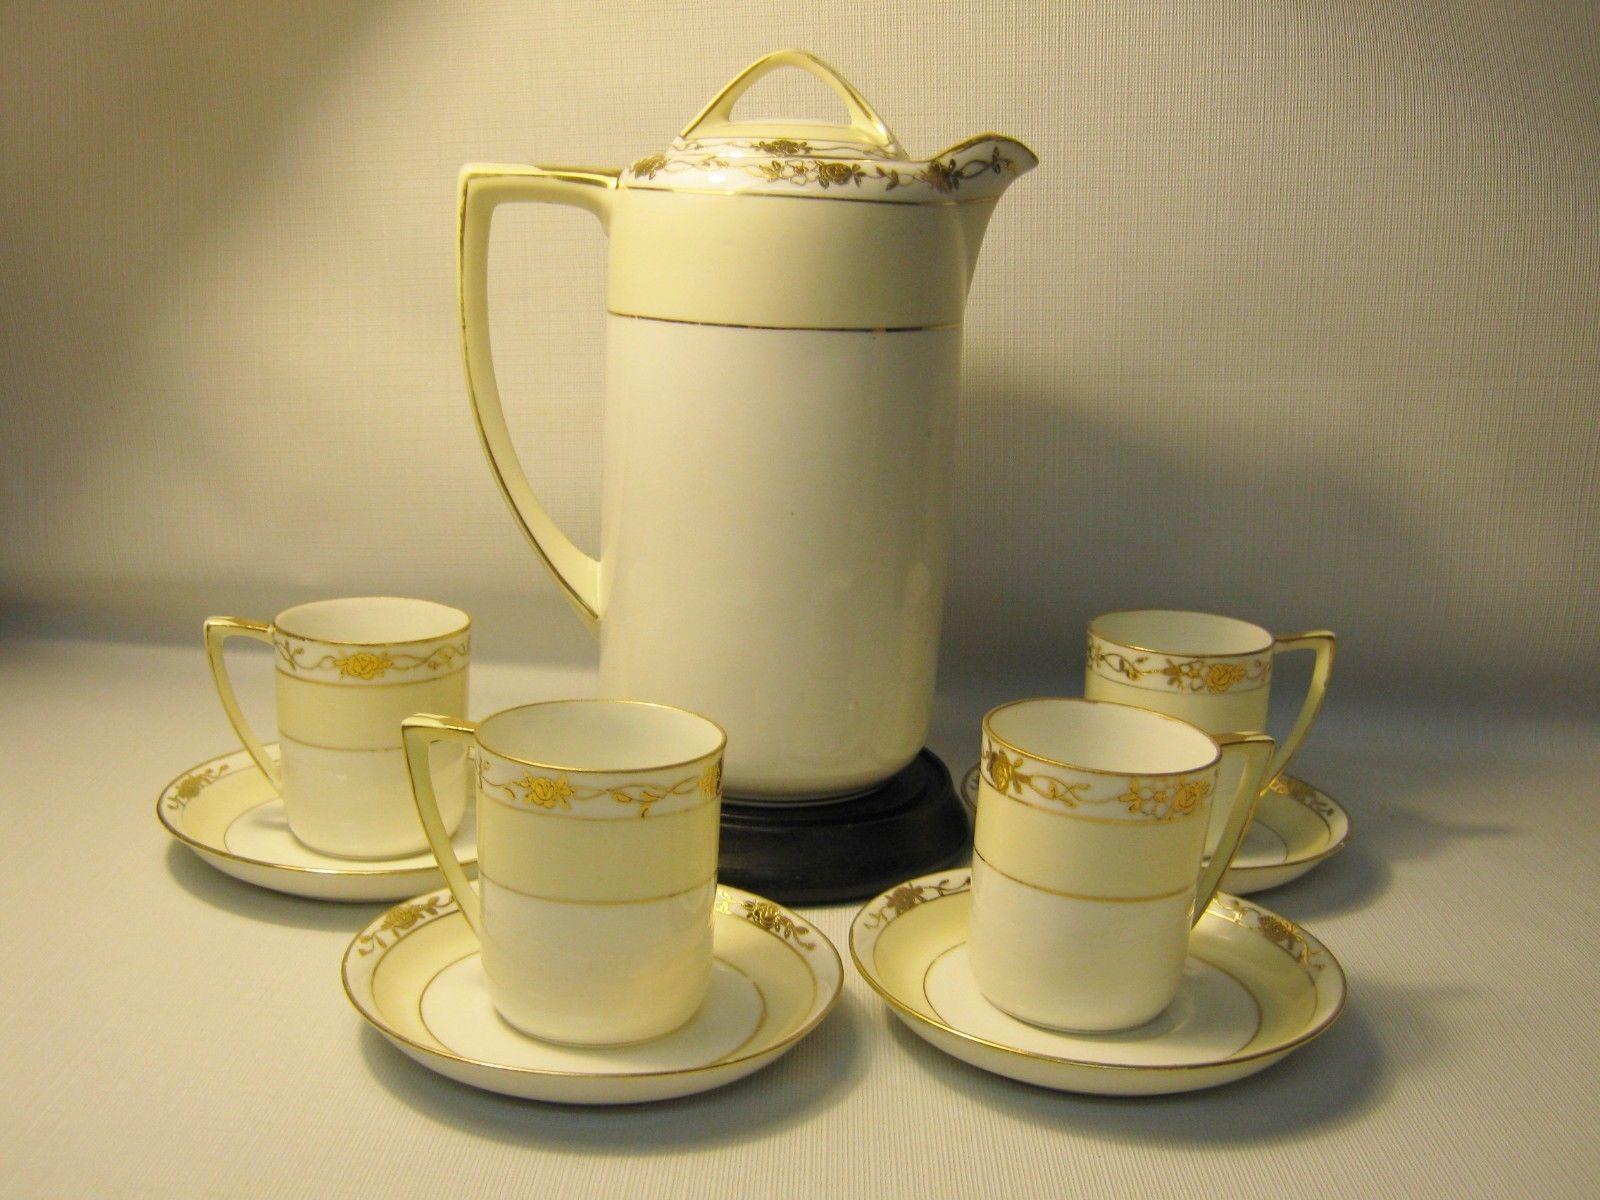 VINTAGE NIPPON PORCELAIN CHOCOLATE POT SET 4 DEMITASSE CUPS SAUCERS WHITE GOLD